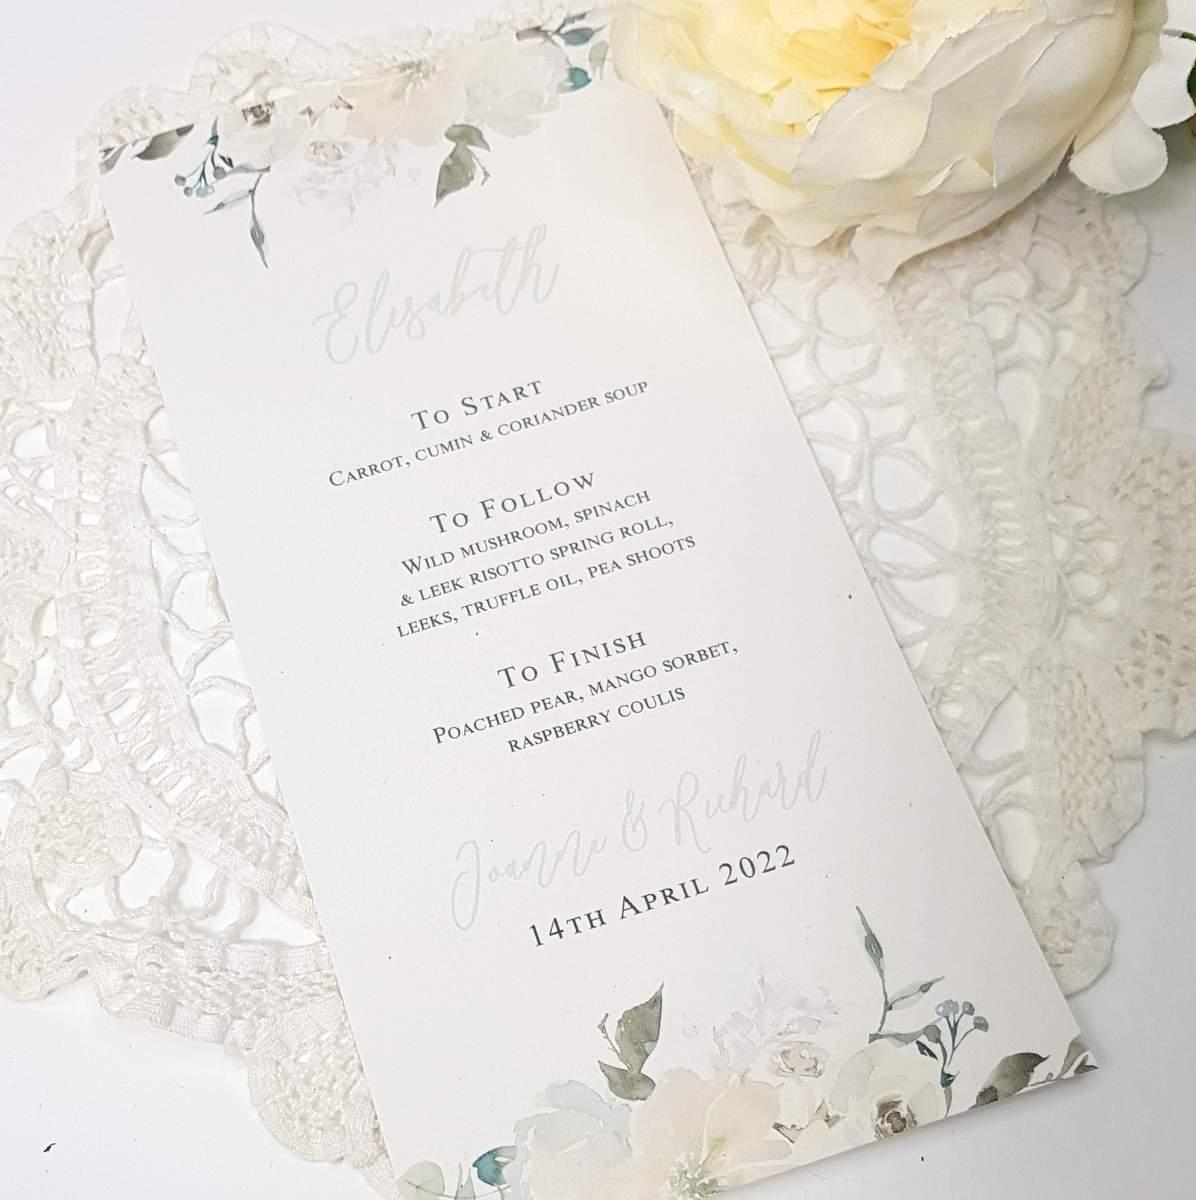 personalised wedding menu with white flowers